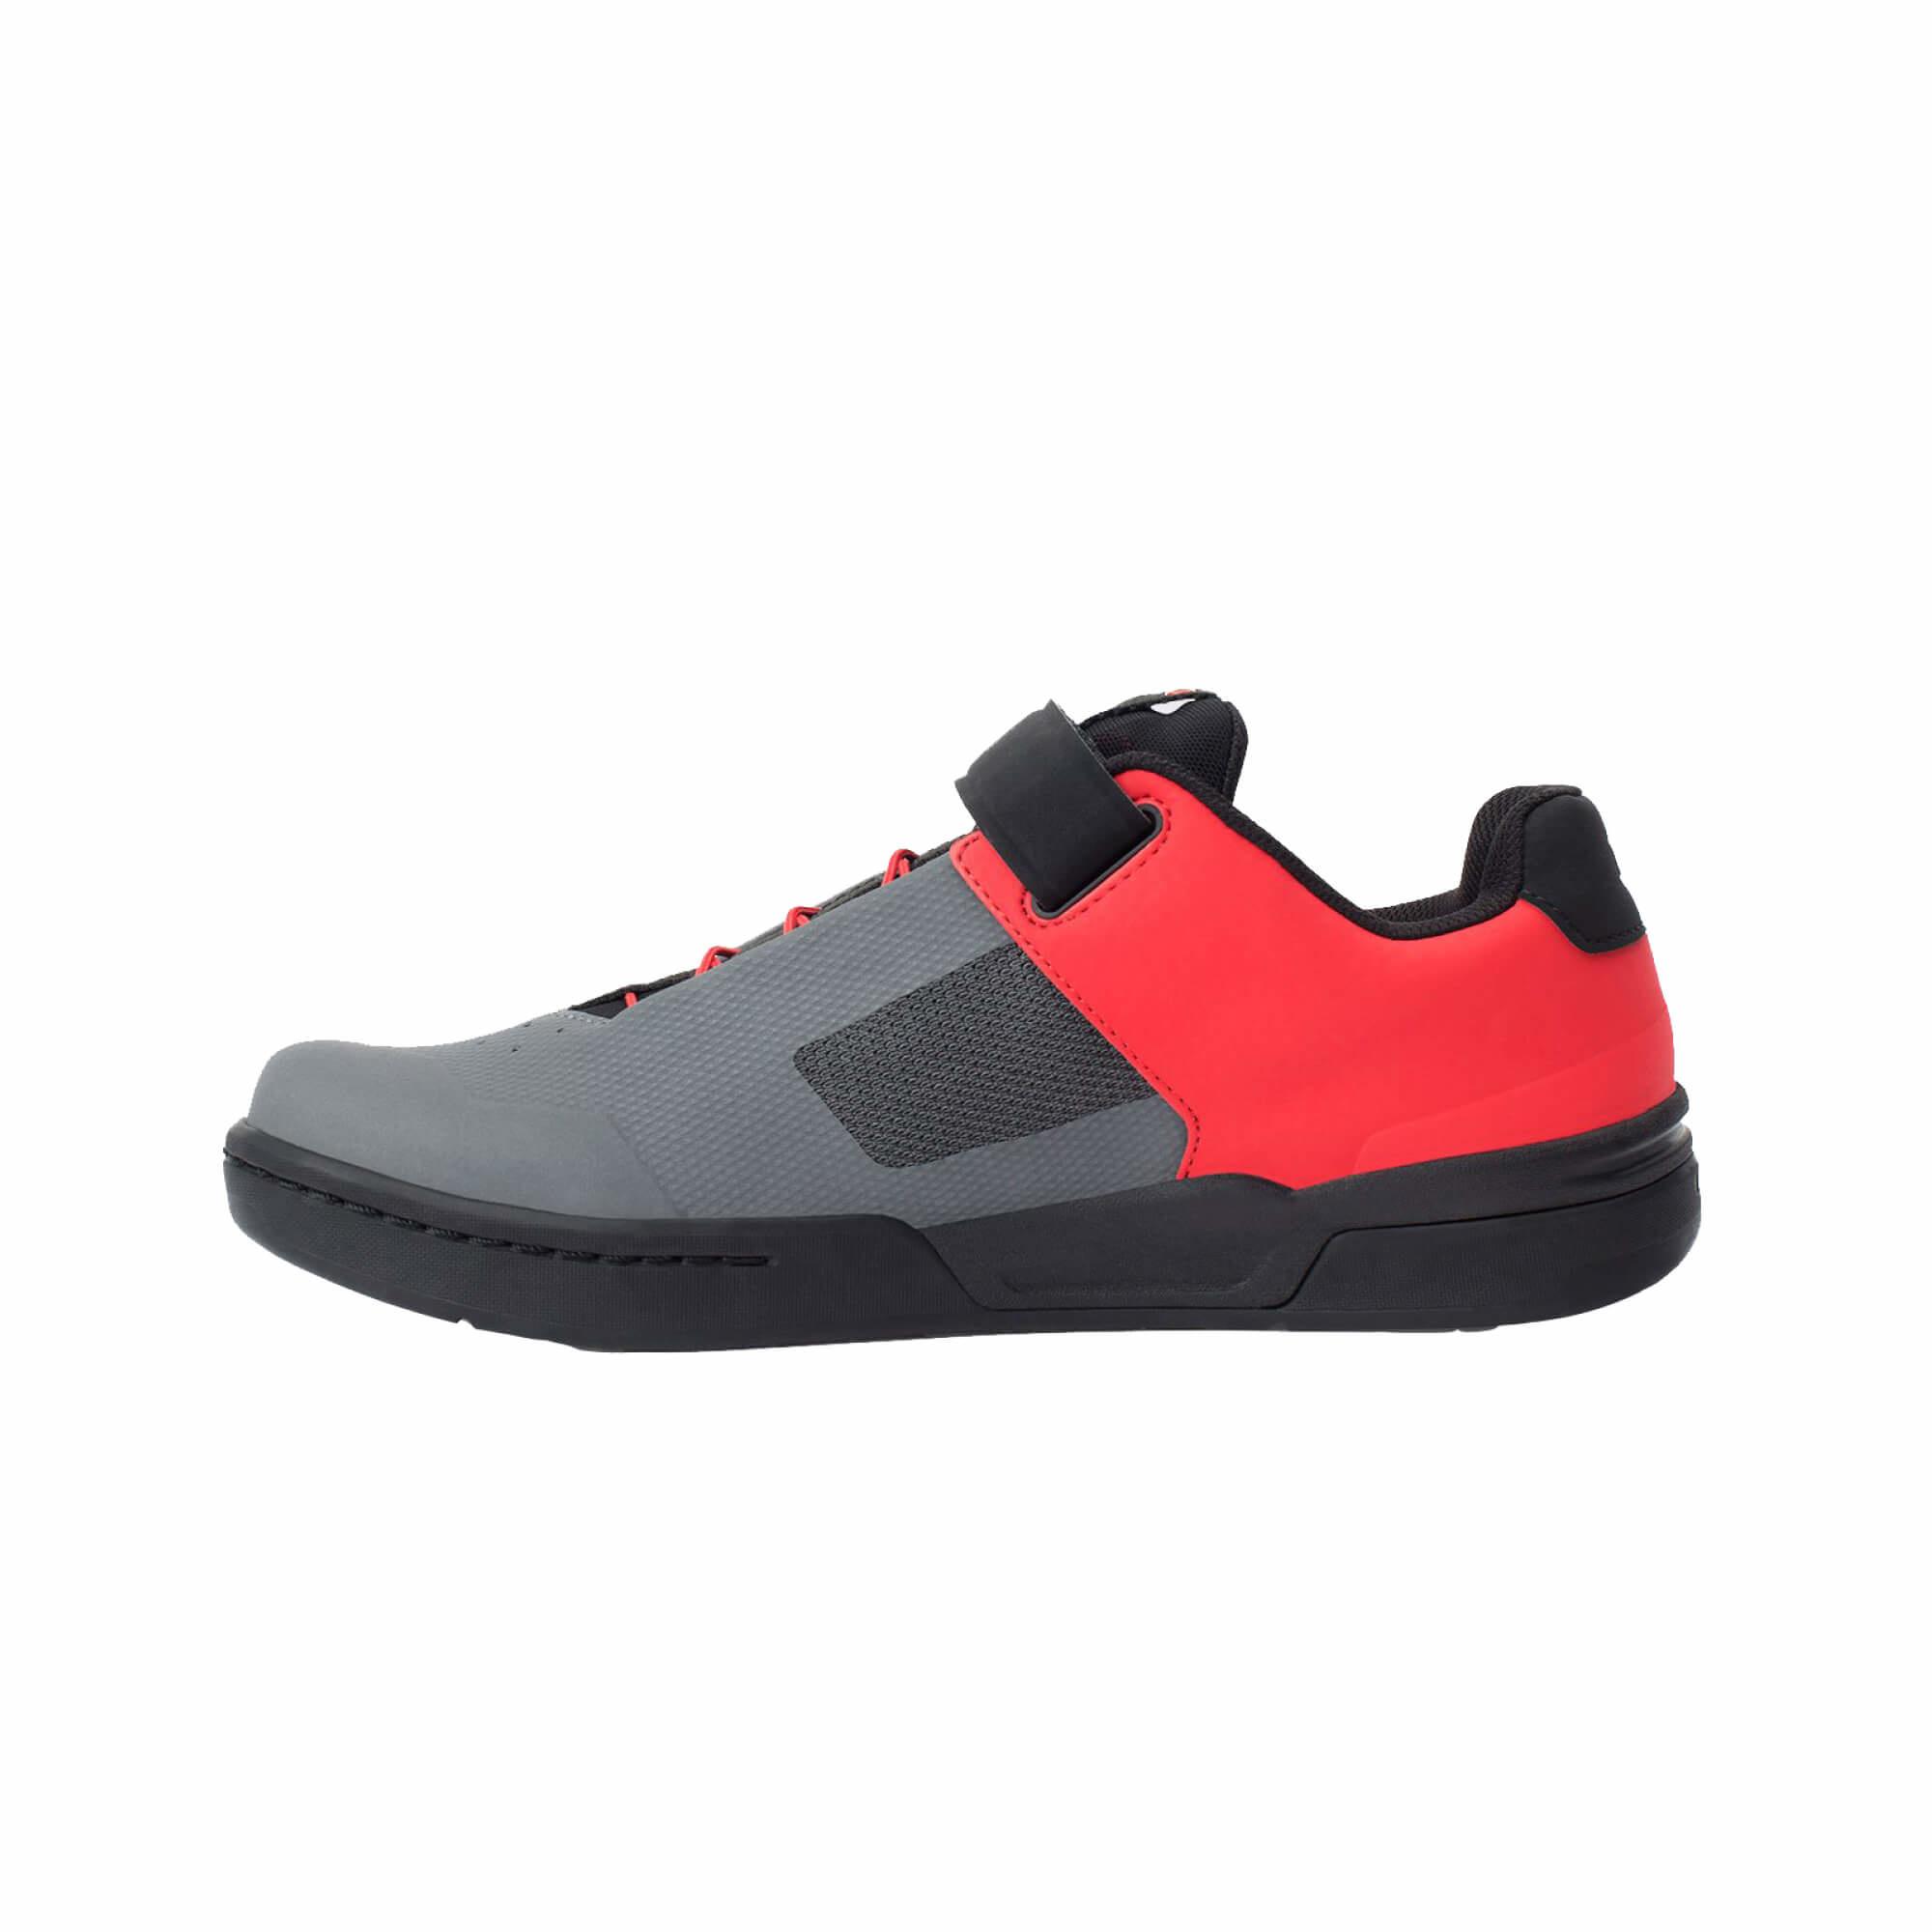 Shoes Stamp Speedlace Flat-2